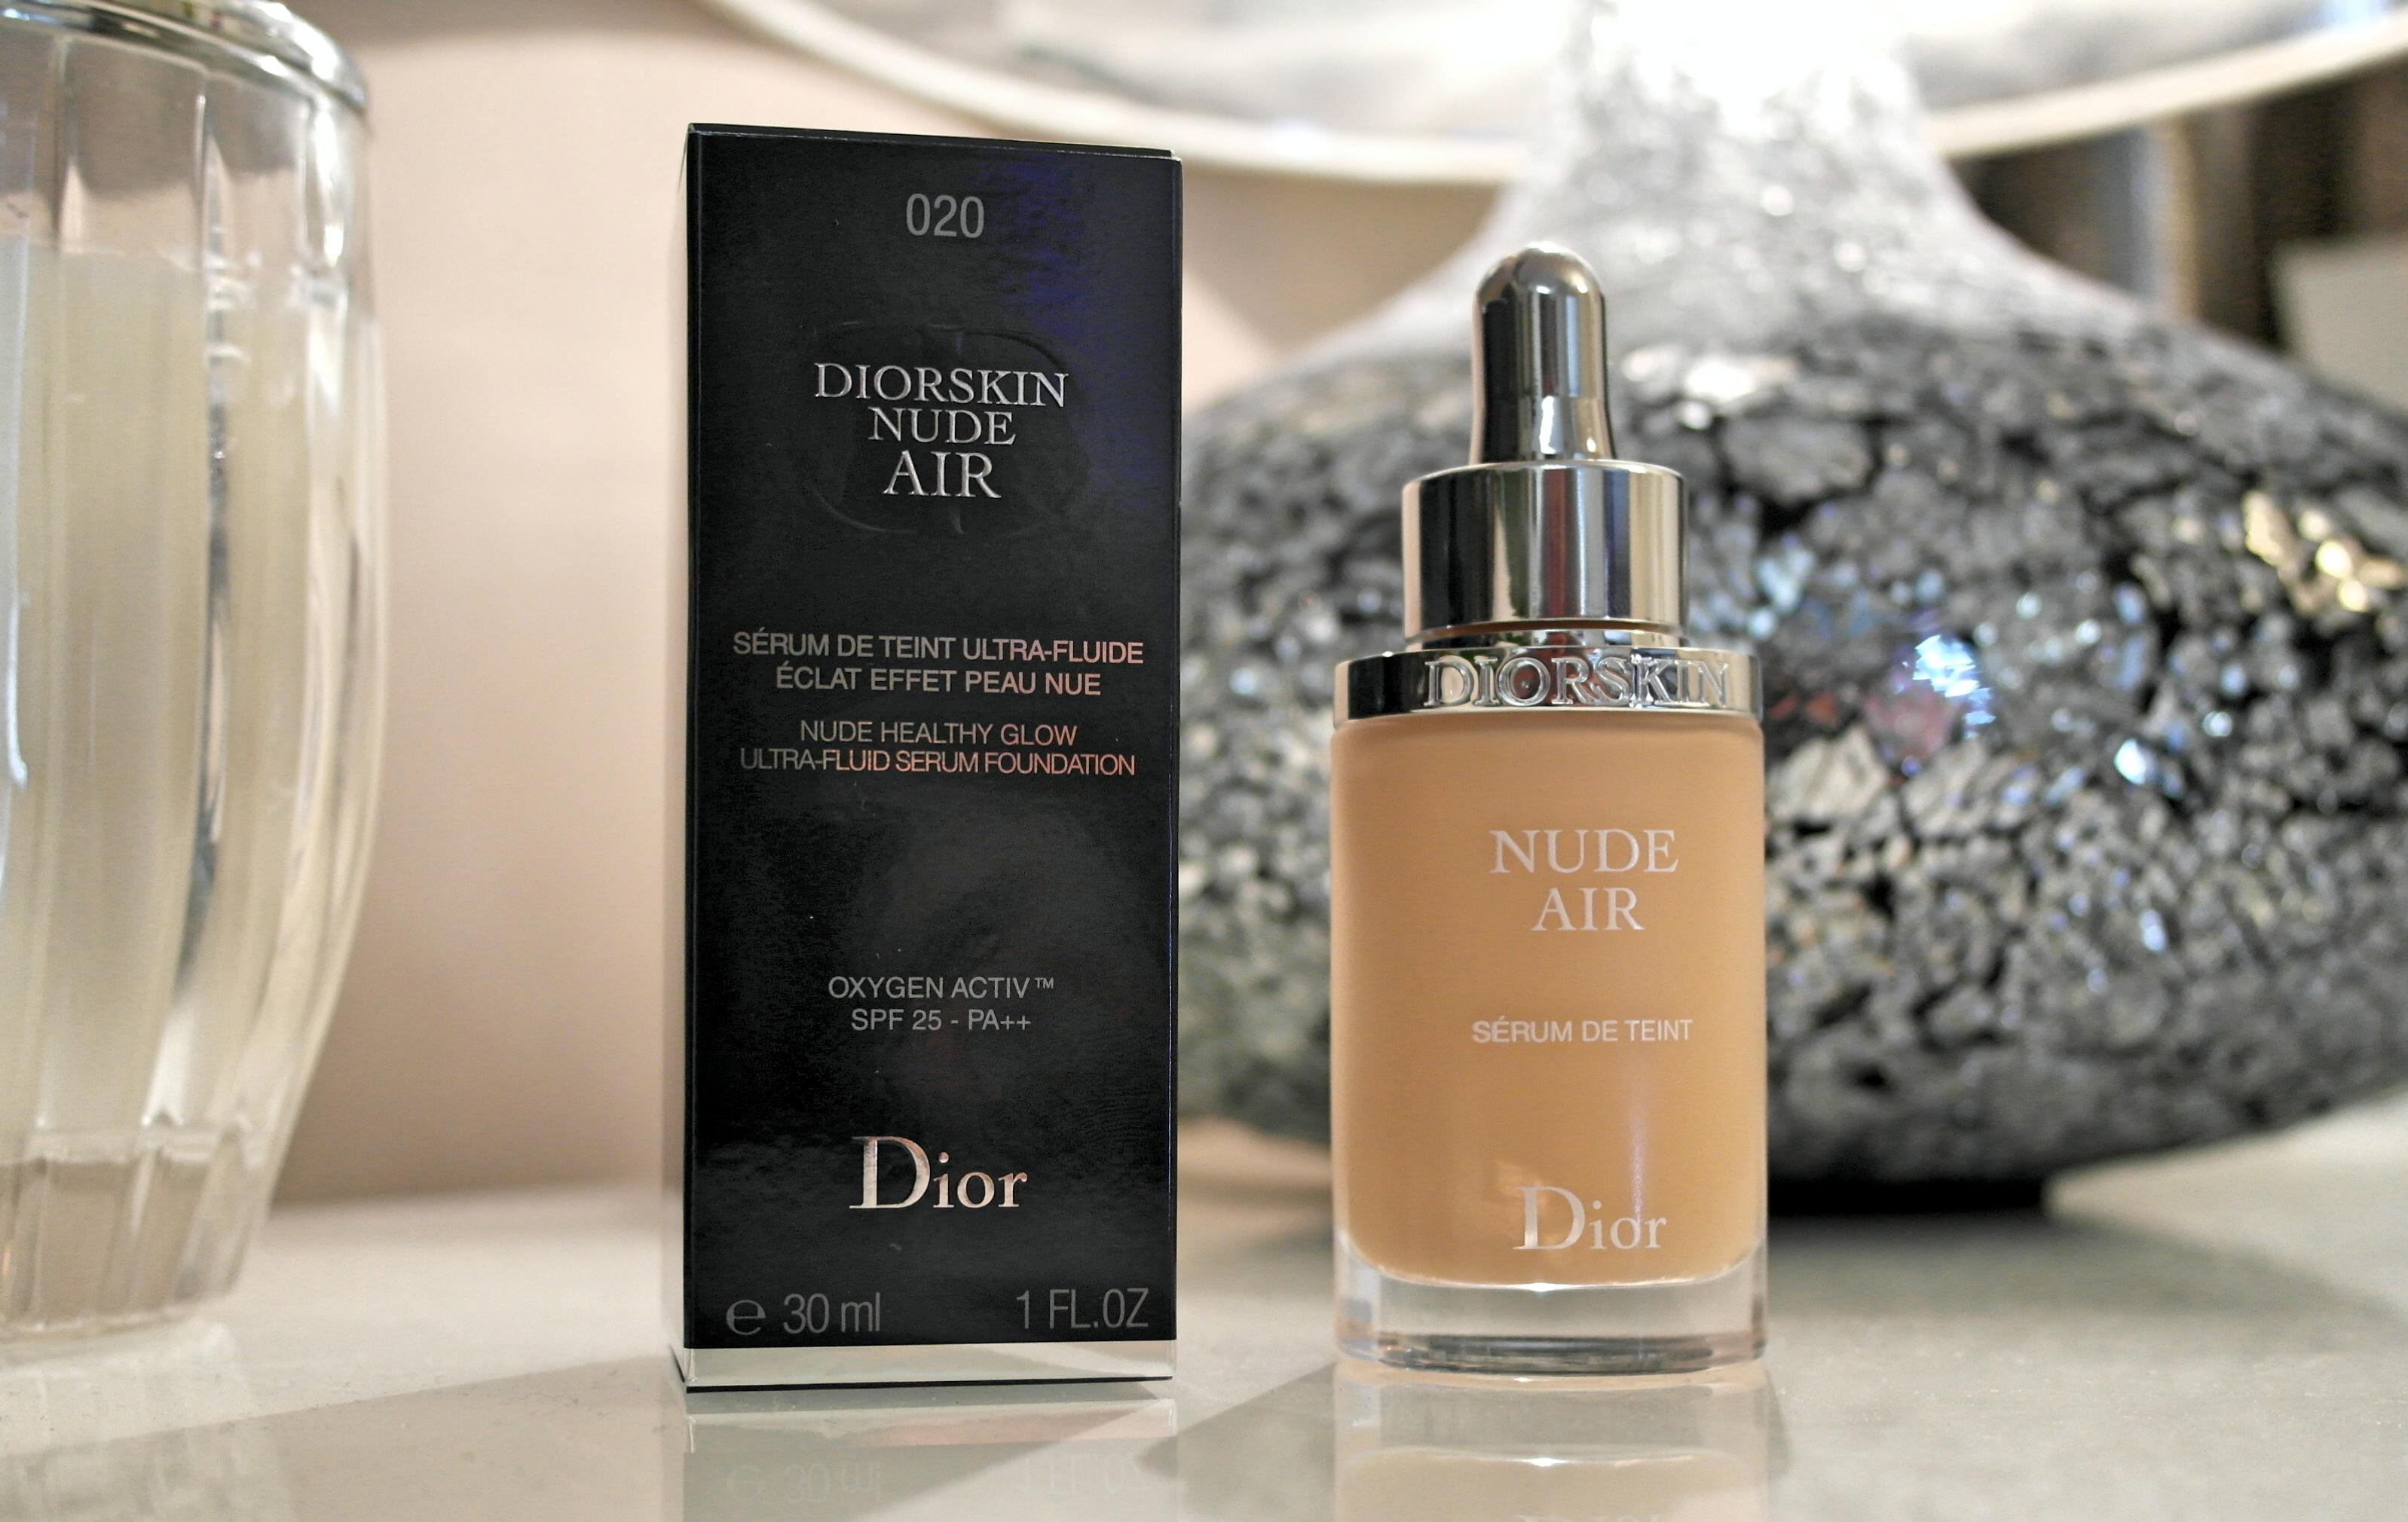 Diorskin nude air serum foundation by dior